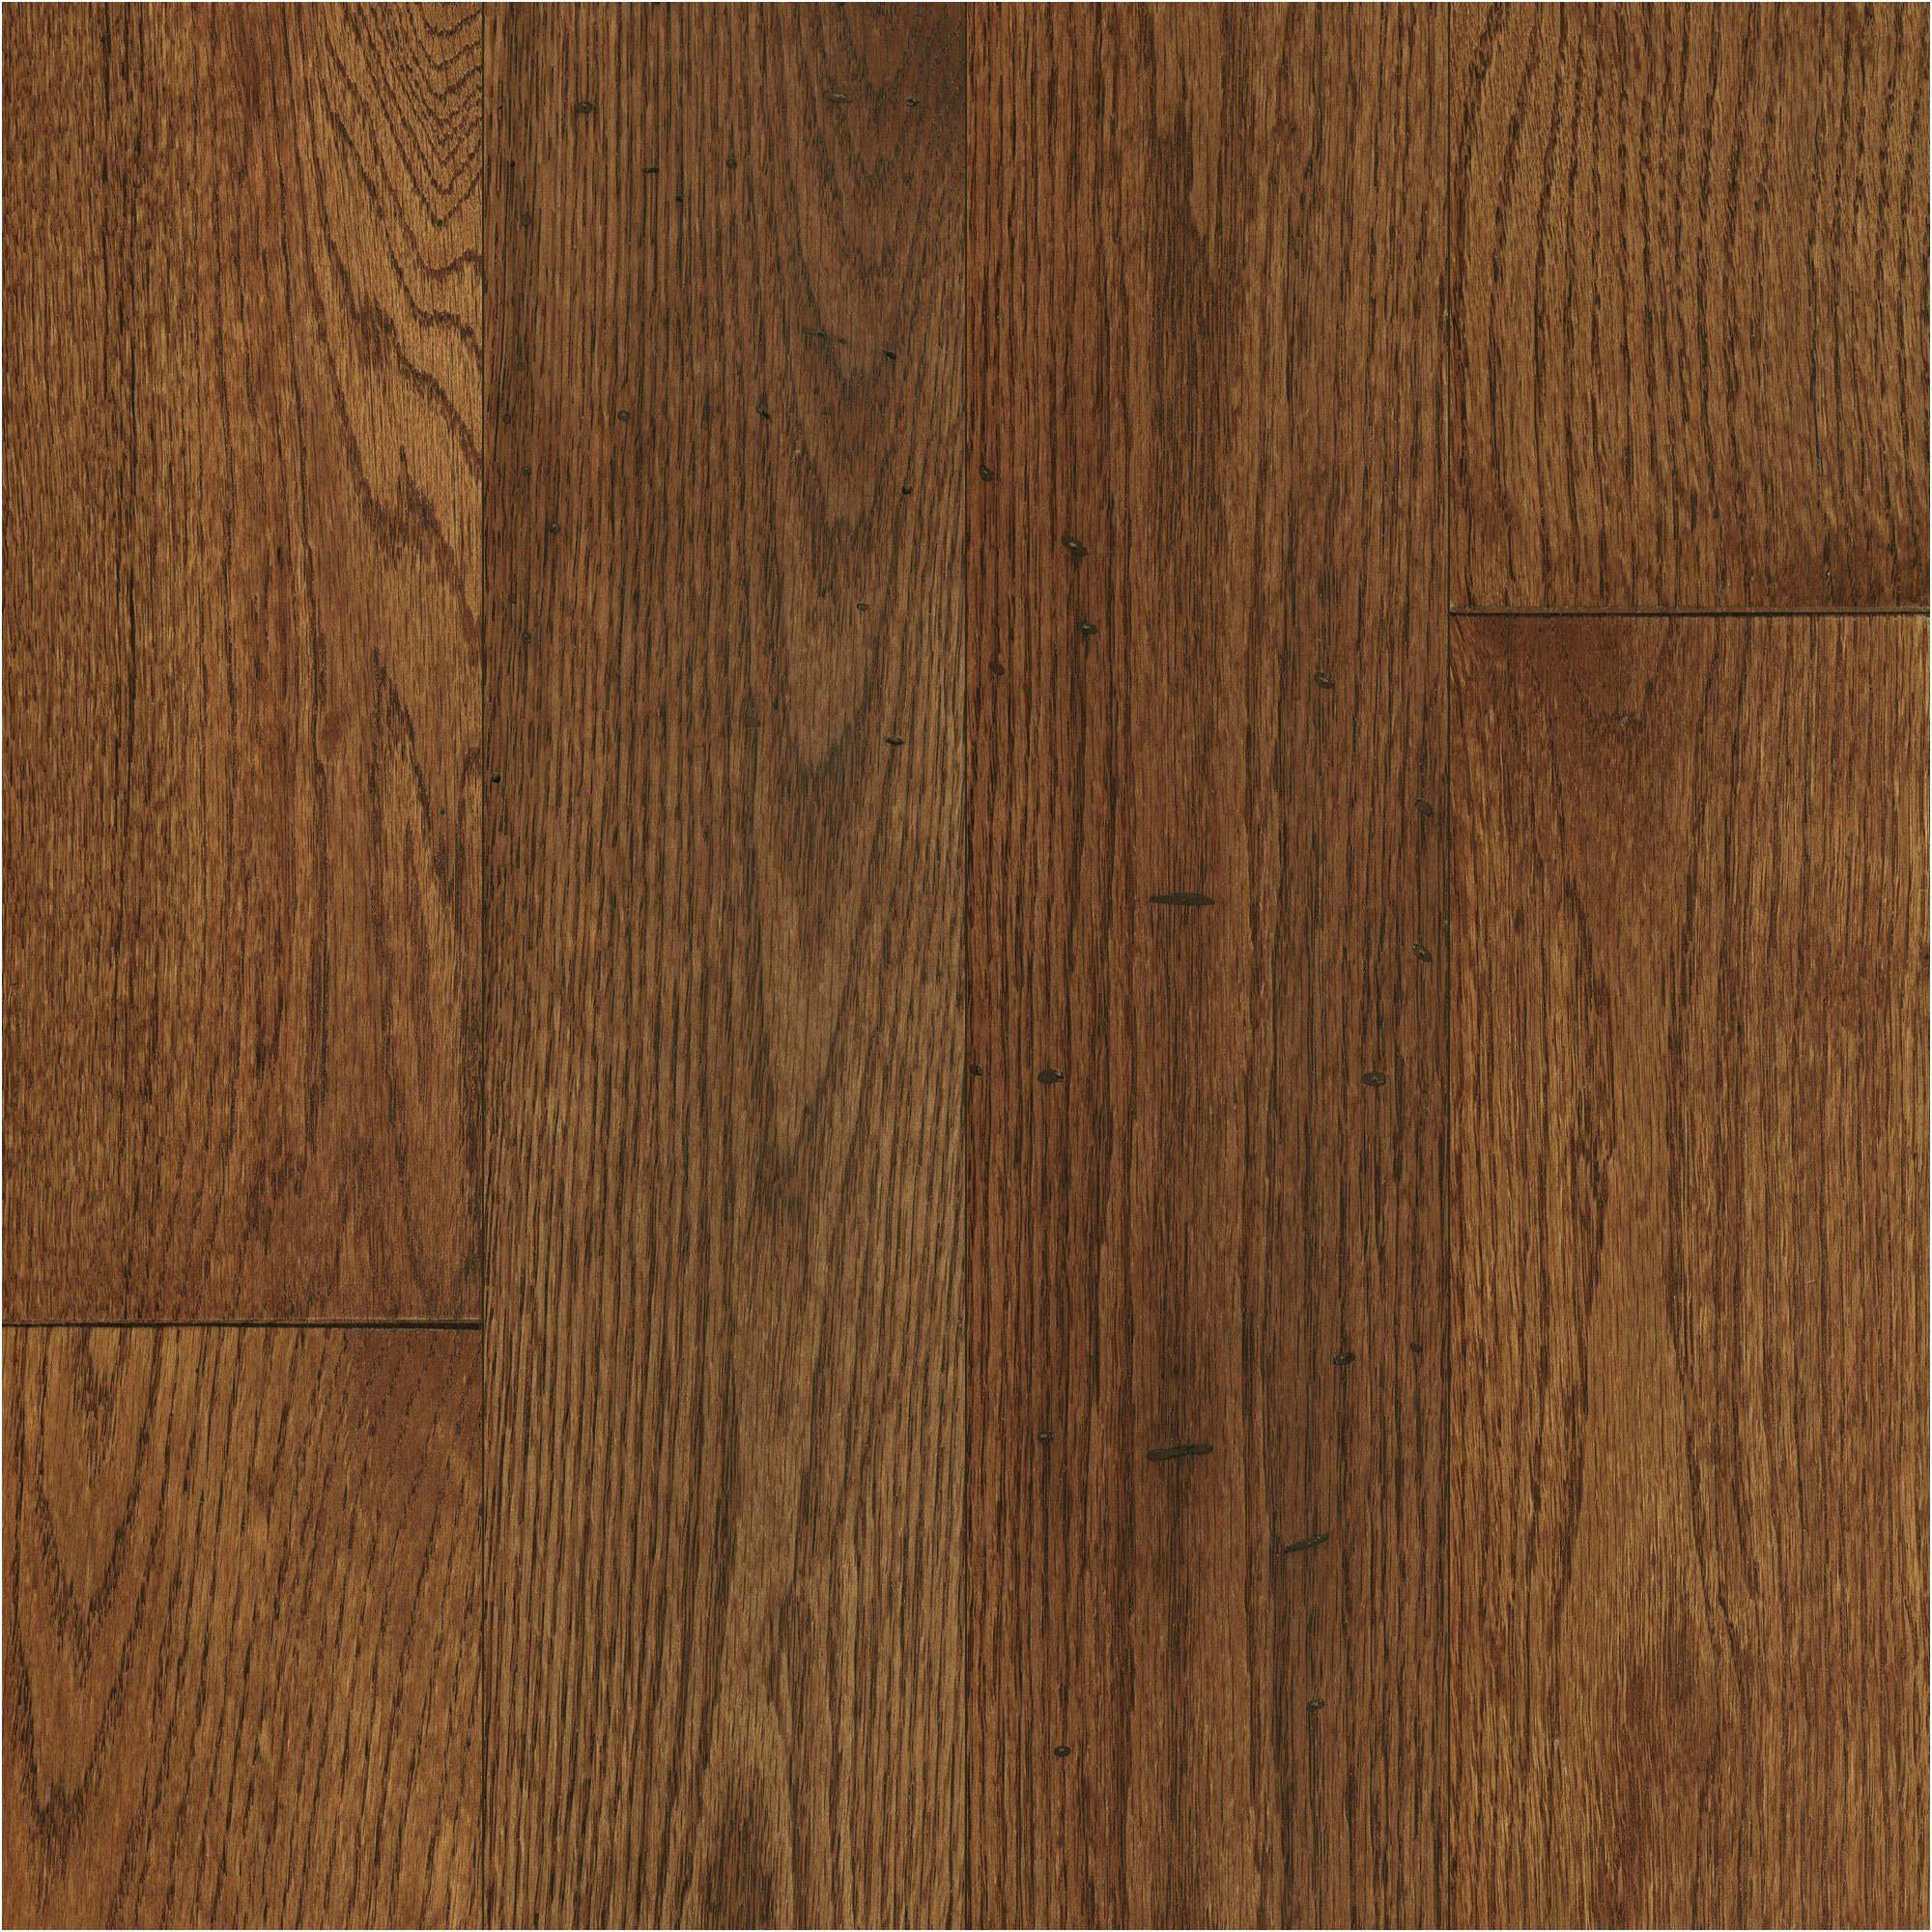 20 Nice Wide Plank Hickory Hardwood Flooring 2021 free download wide plank hickory hardwood flooring of laminate flooring vs engineered hardwood beautiful custom hickory with regard to laminate flooring vs engineered hardwood new hardwood floor design sw